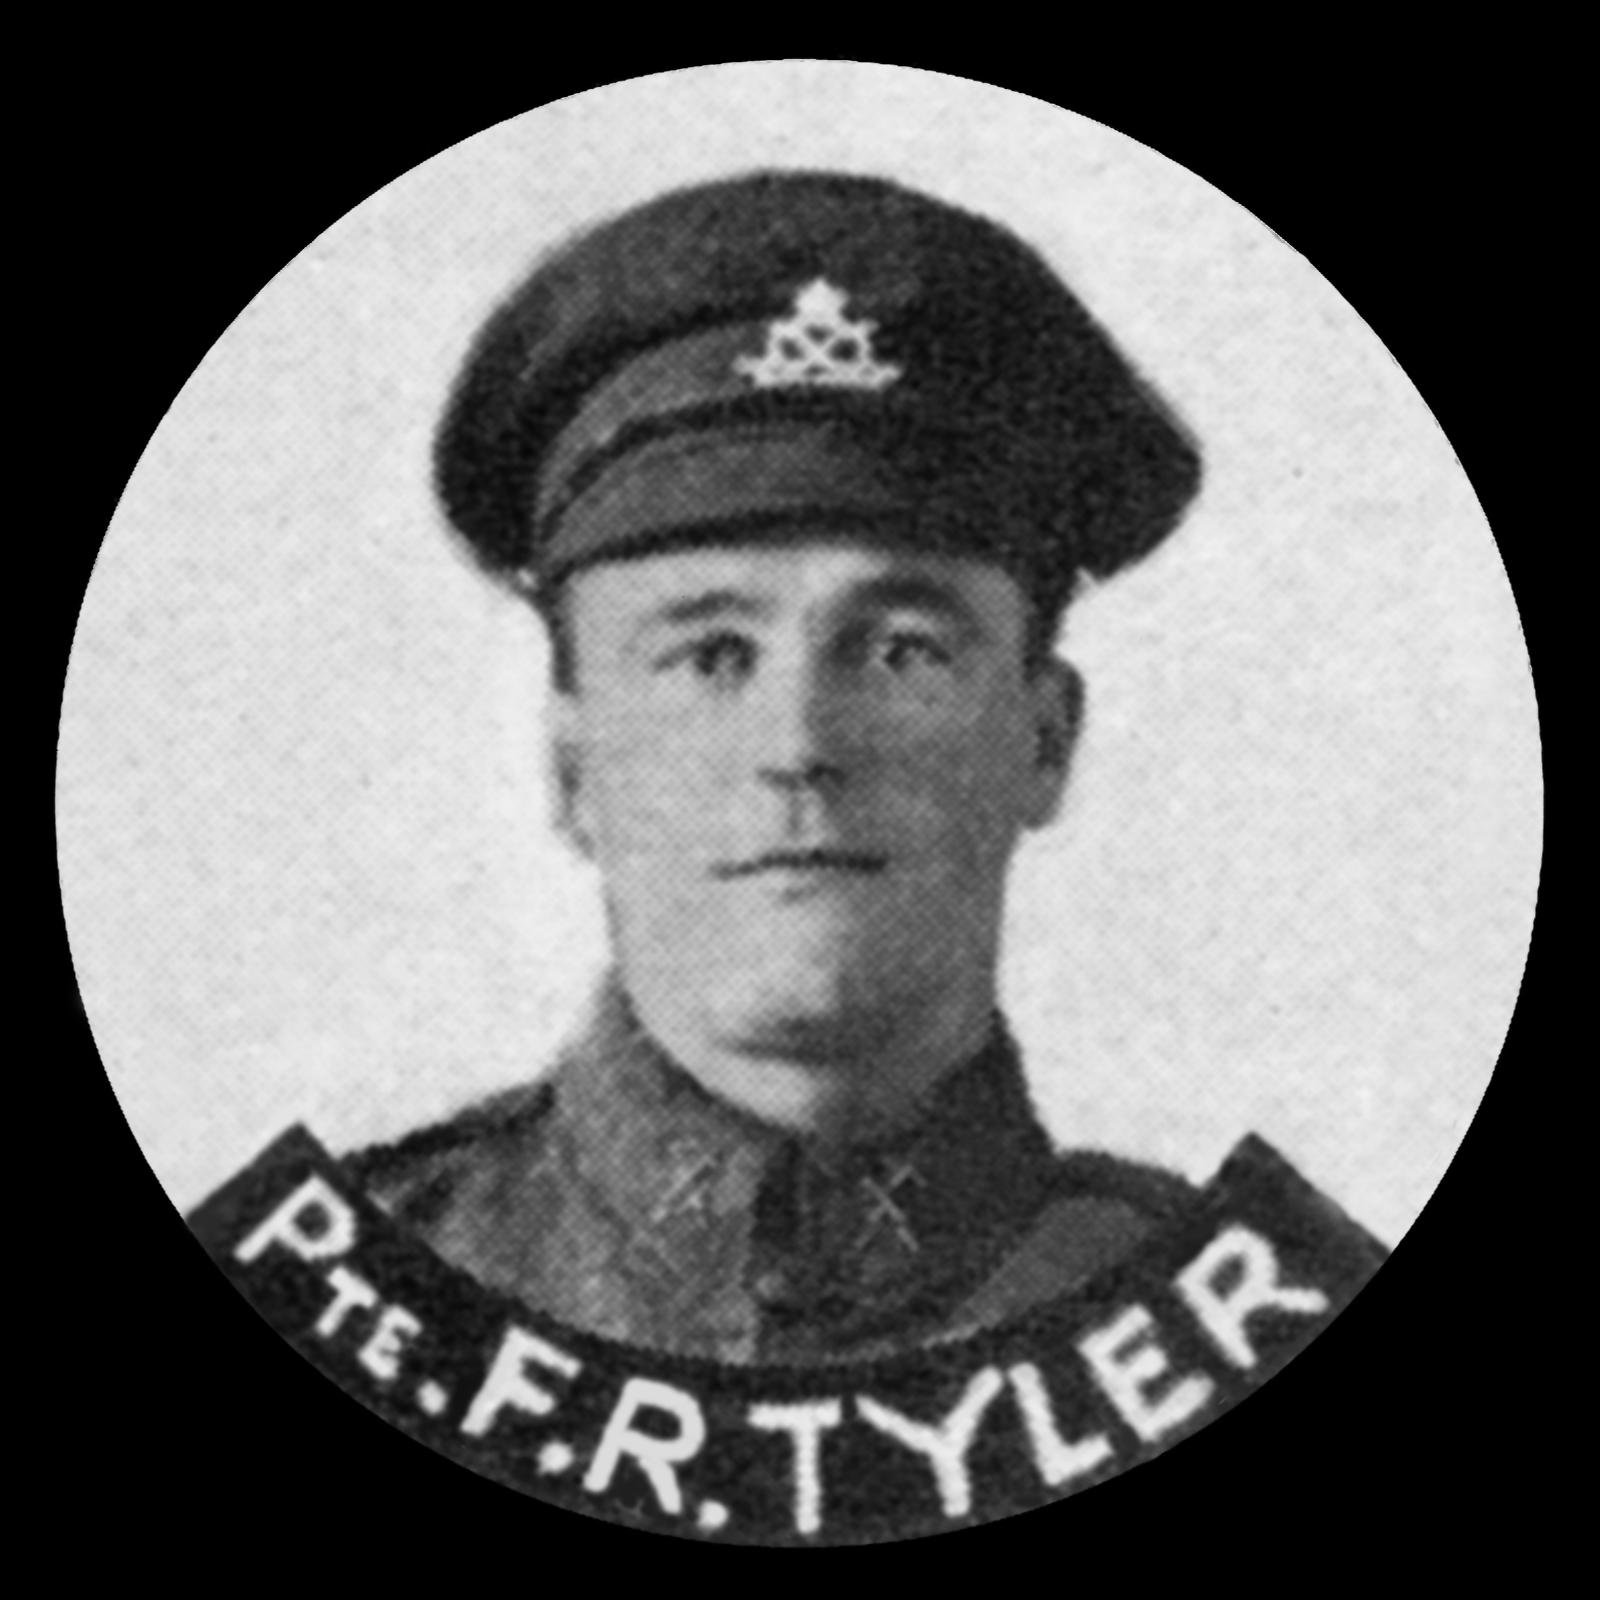 TYLER Frank Raymond